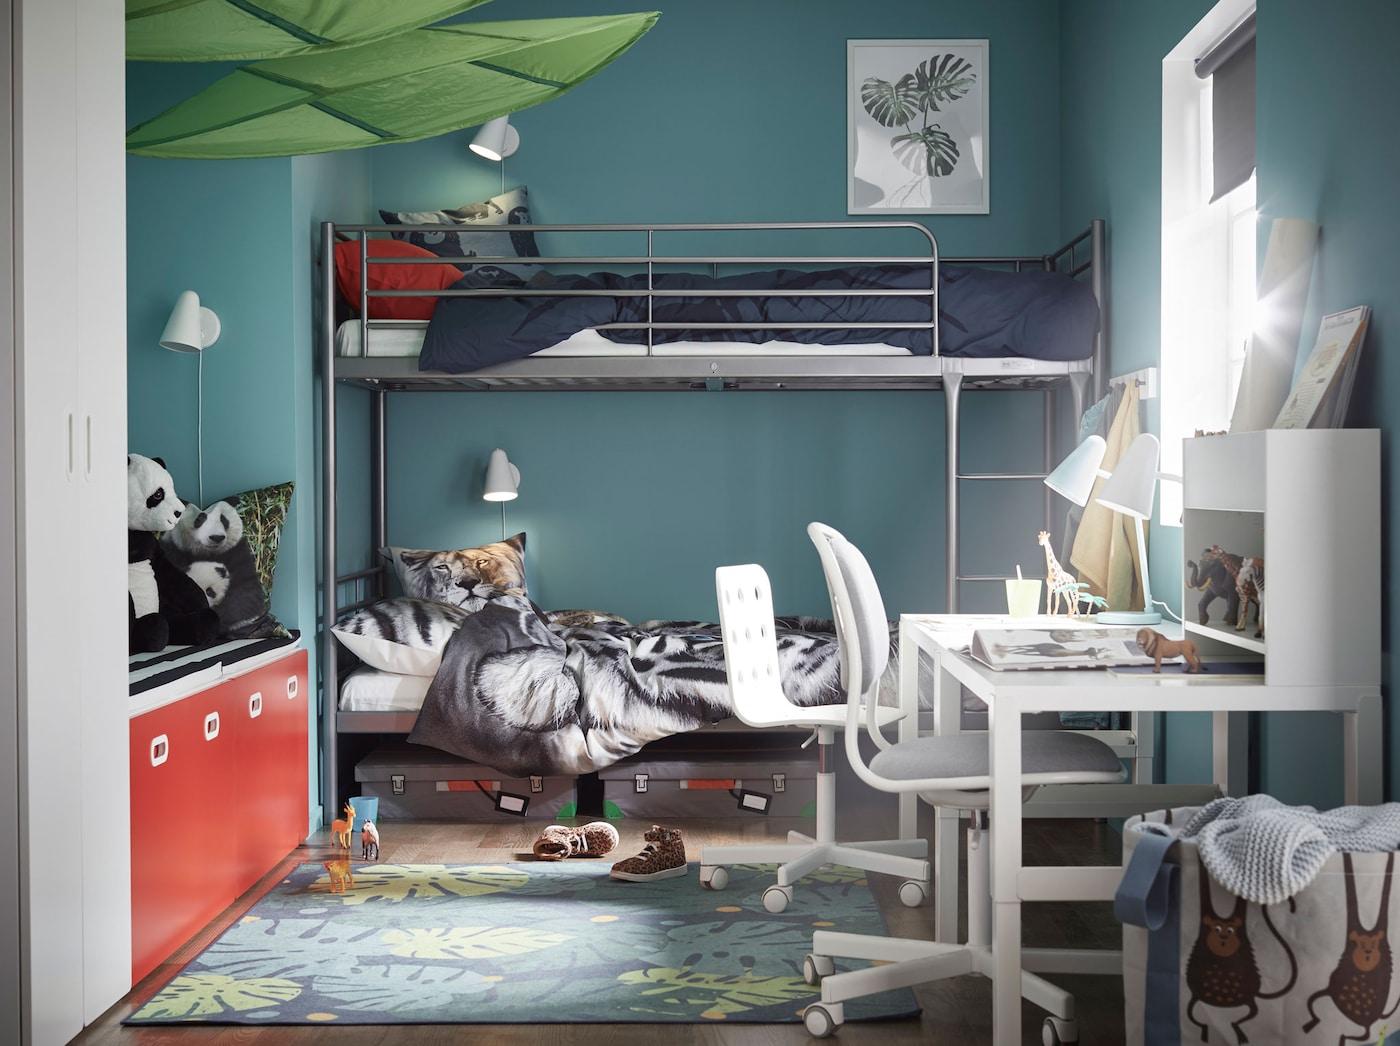 Etagenbett Ikea Weiss : Glänzend ikea etagenbett tuffing weiss jpg mit rutsche full size